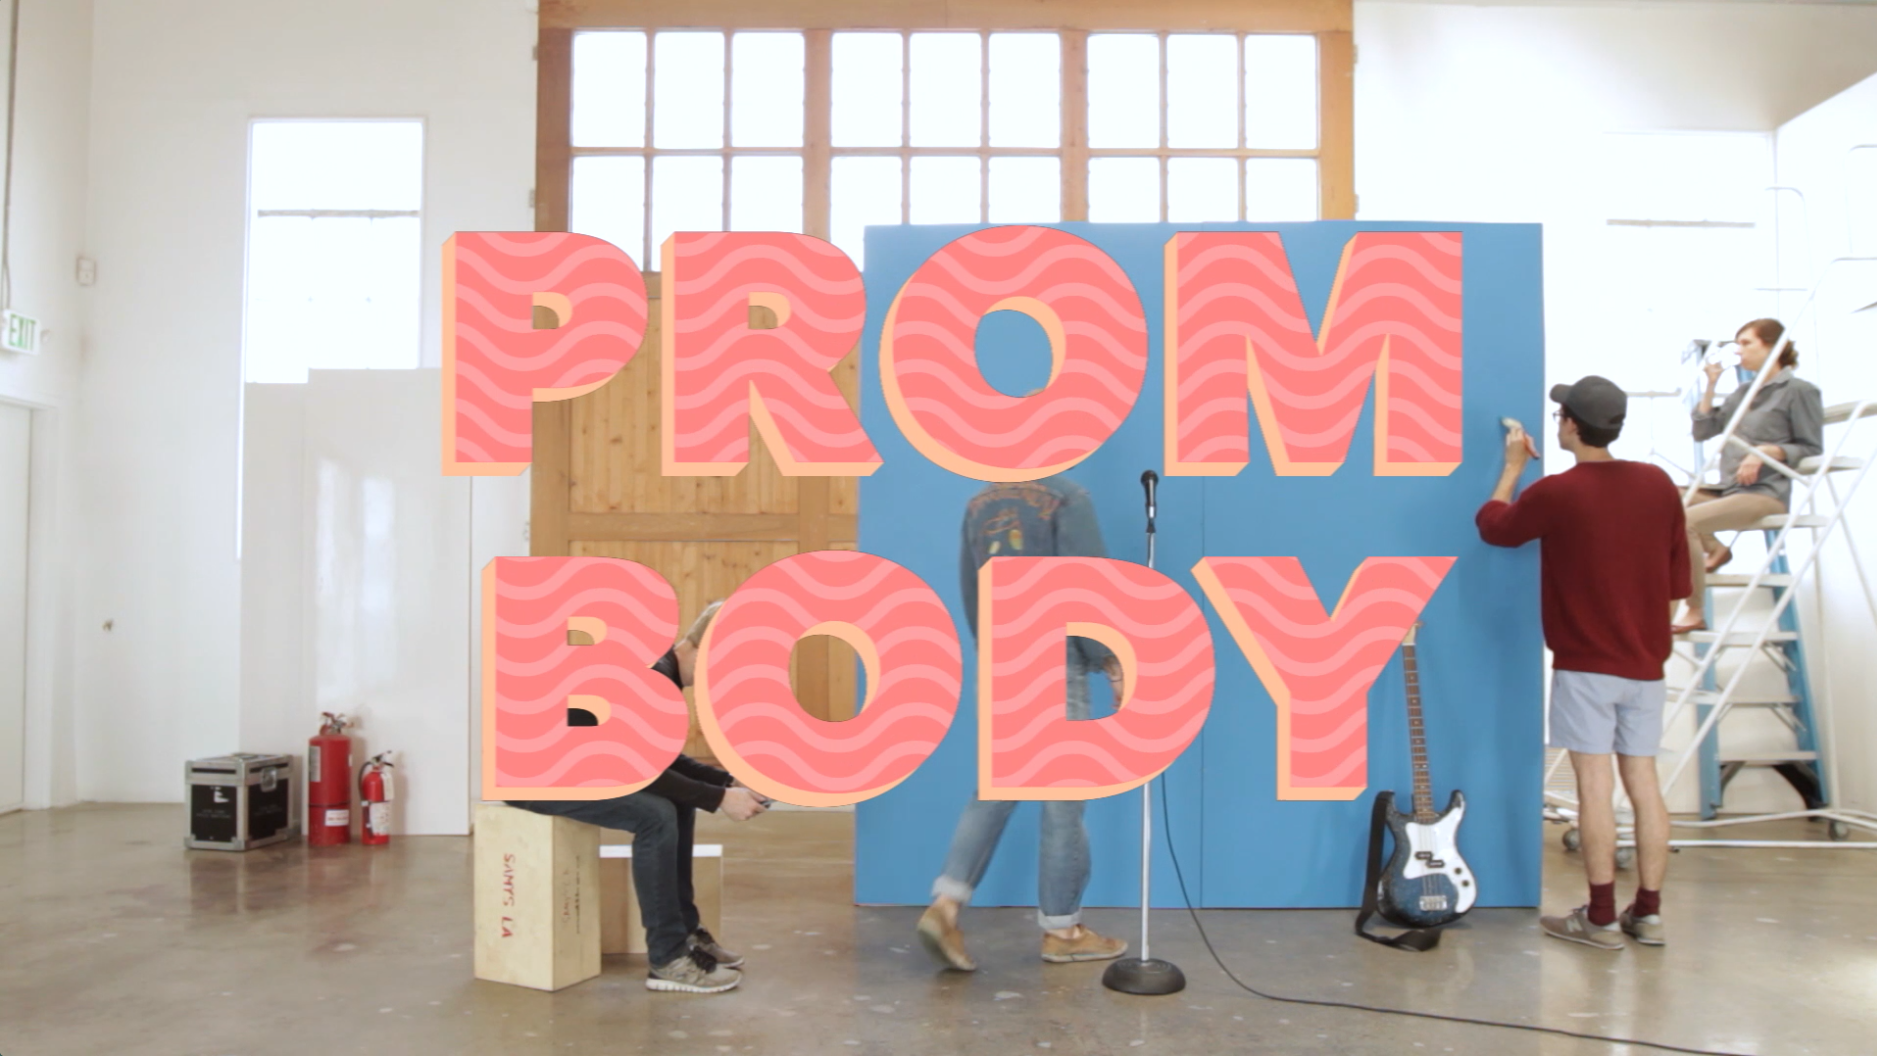 Prom Body - My Paradise